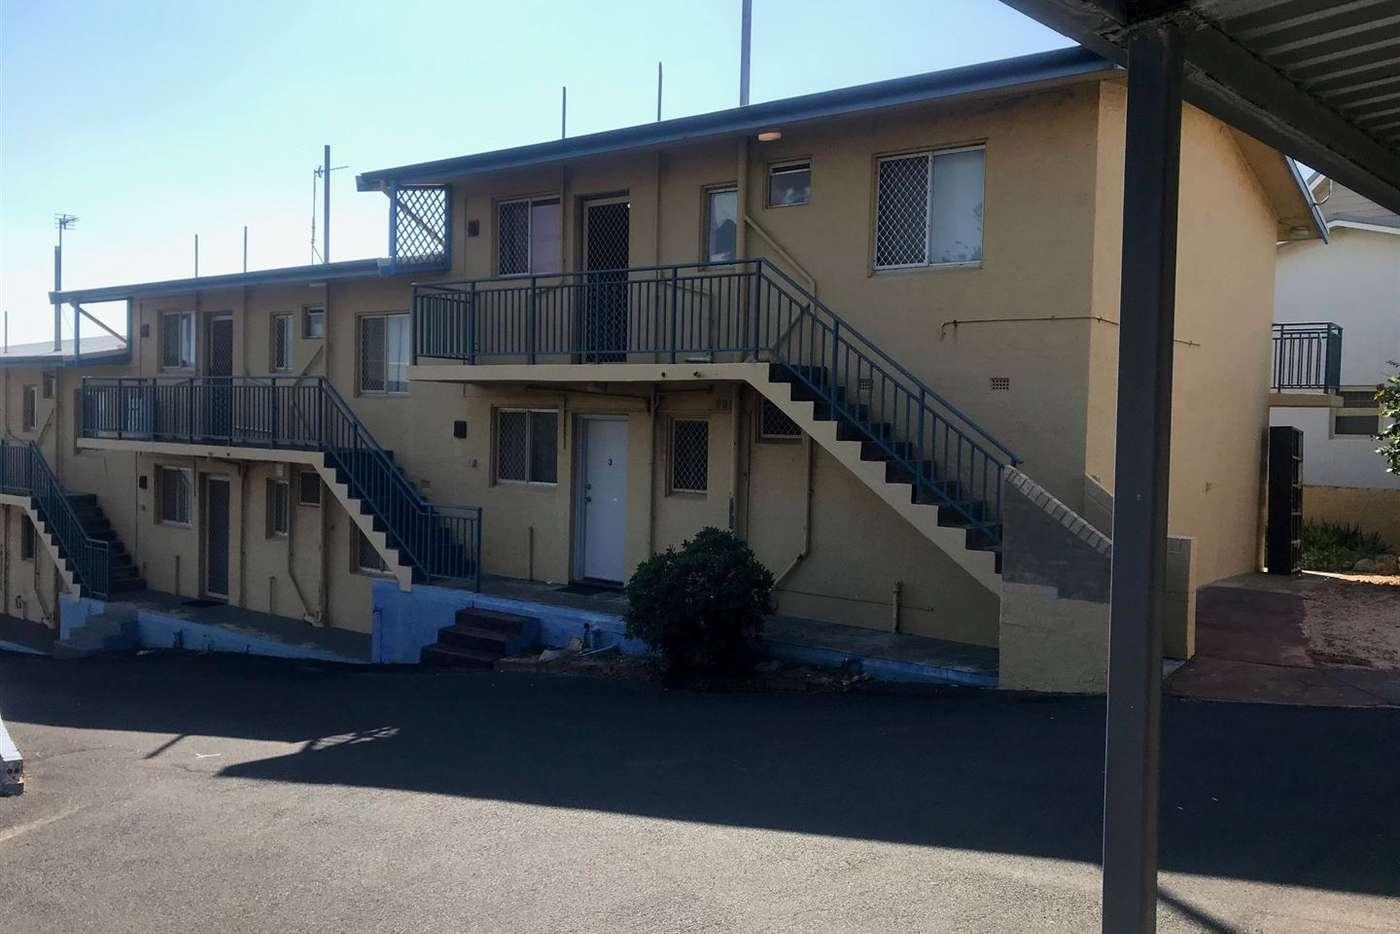 Main view of Homely apartment listing, 3/105 Ocean Drive, Bunbury WA 6230